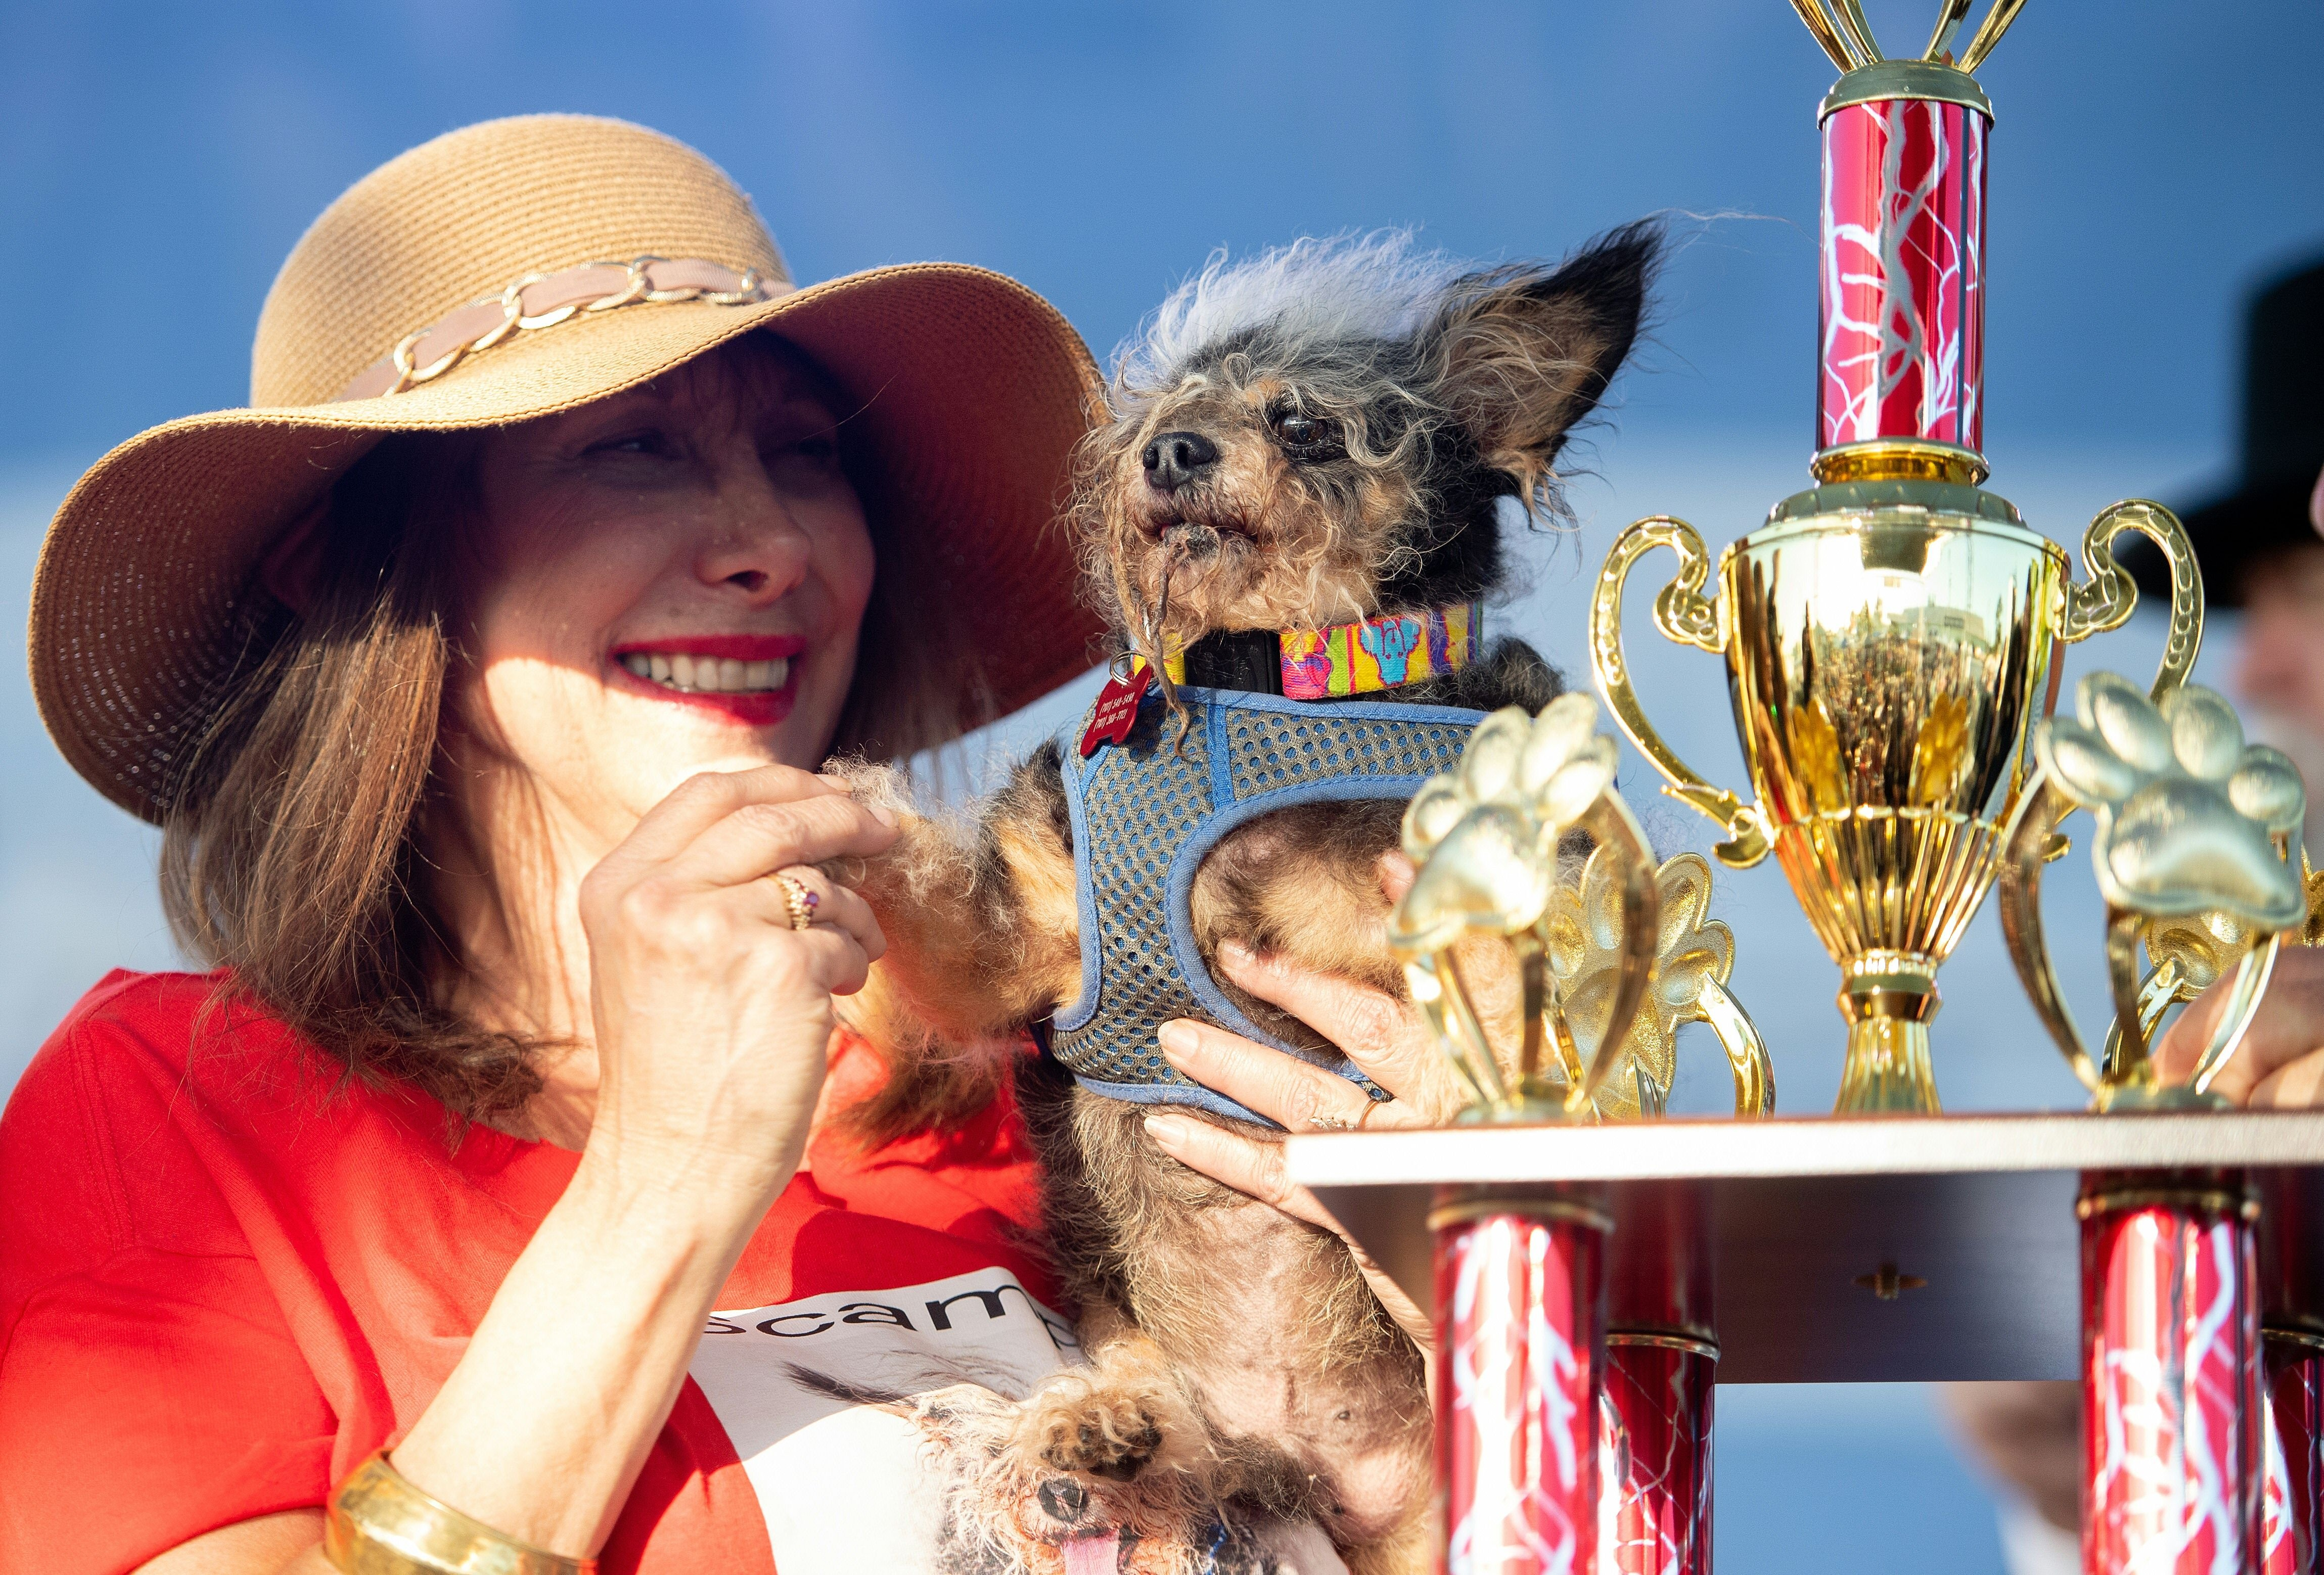 scamp the tramp worlds ugliest dog contest winner